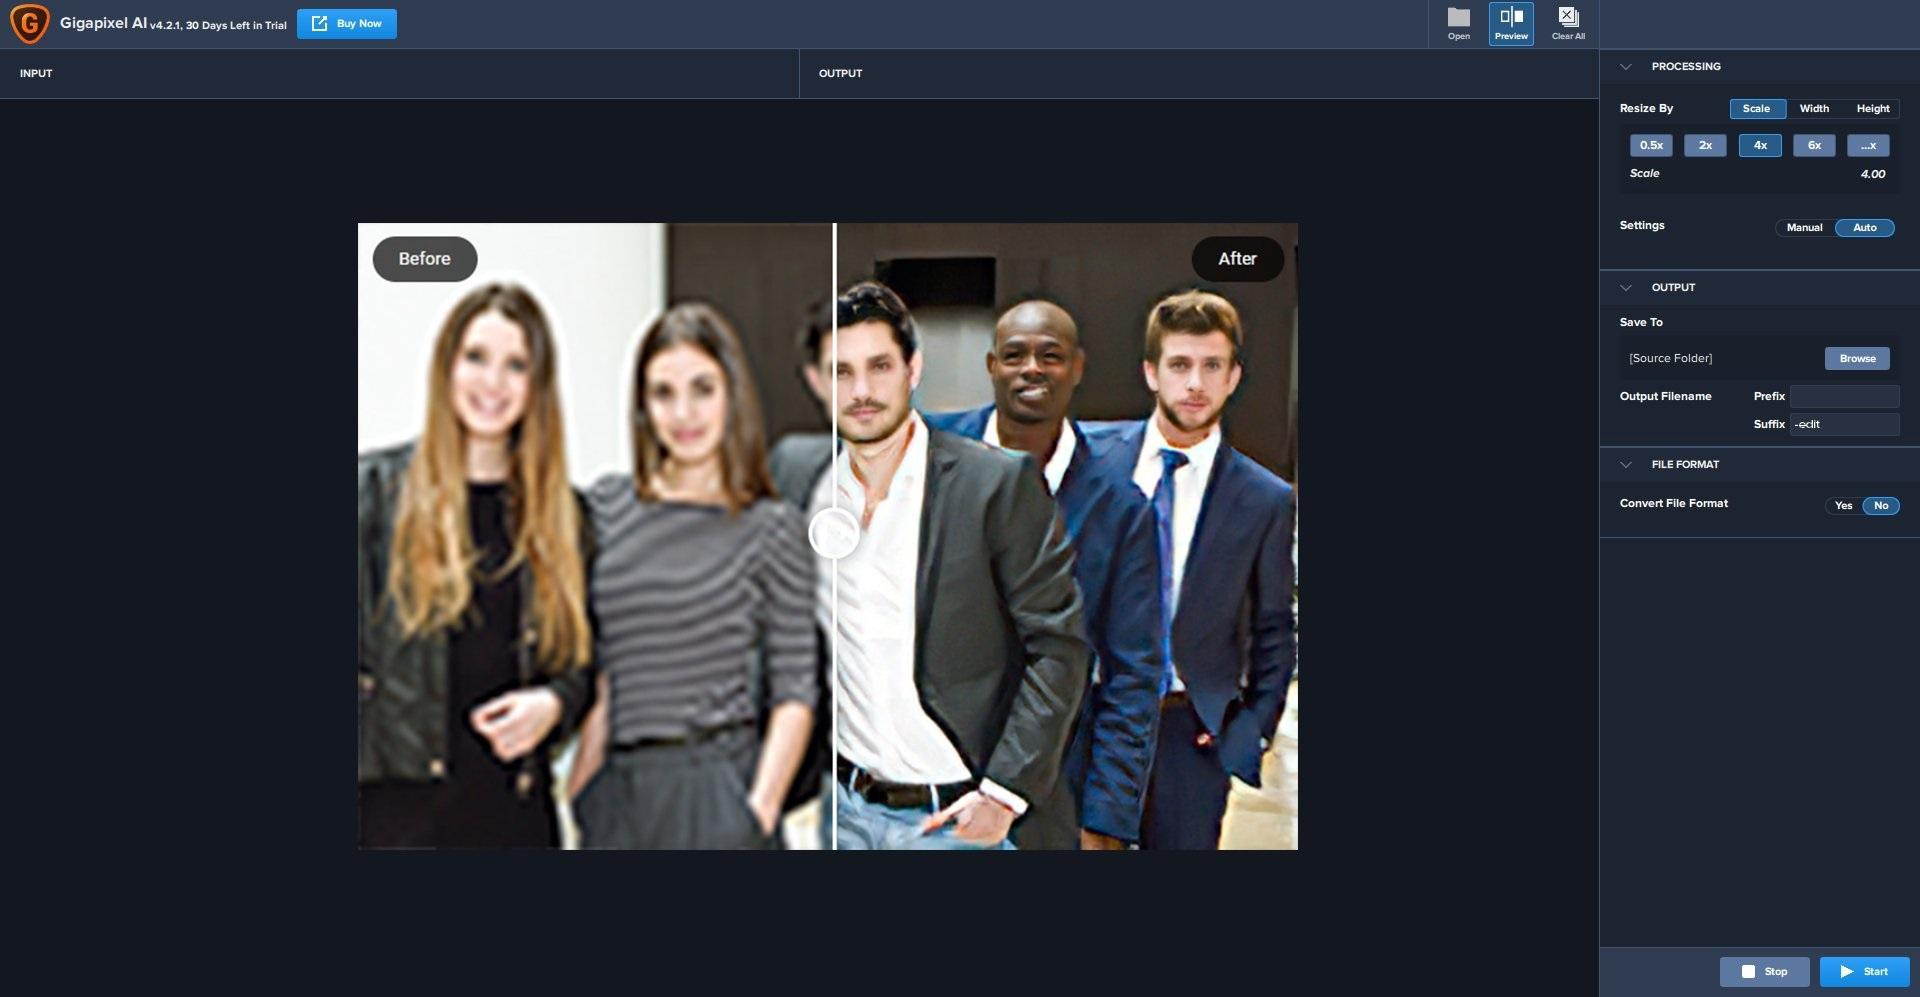 Topaz Gigapixel AI.jpg